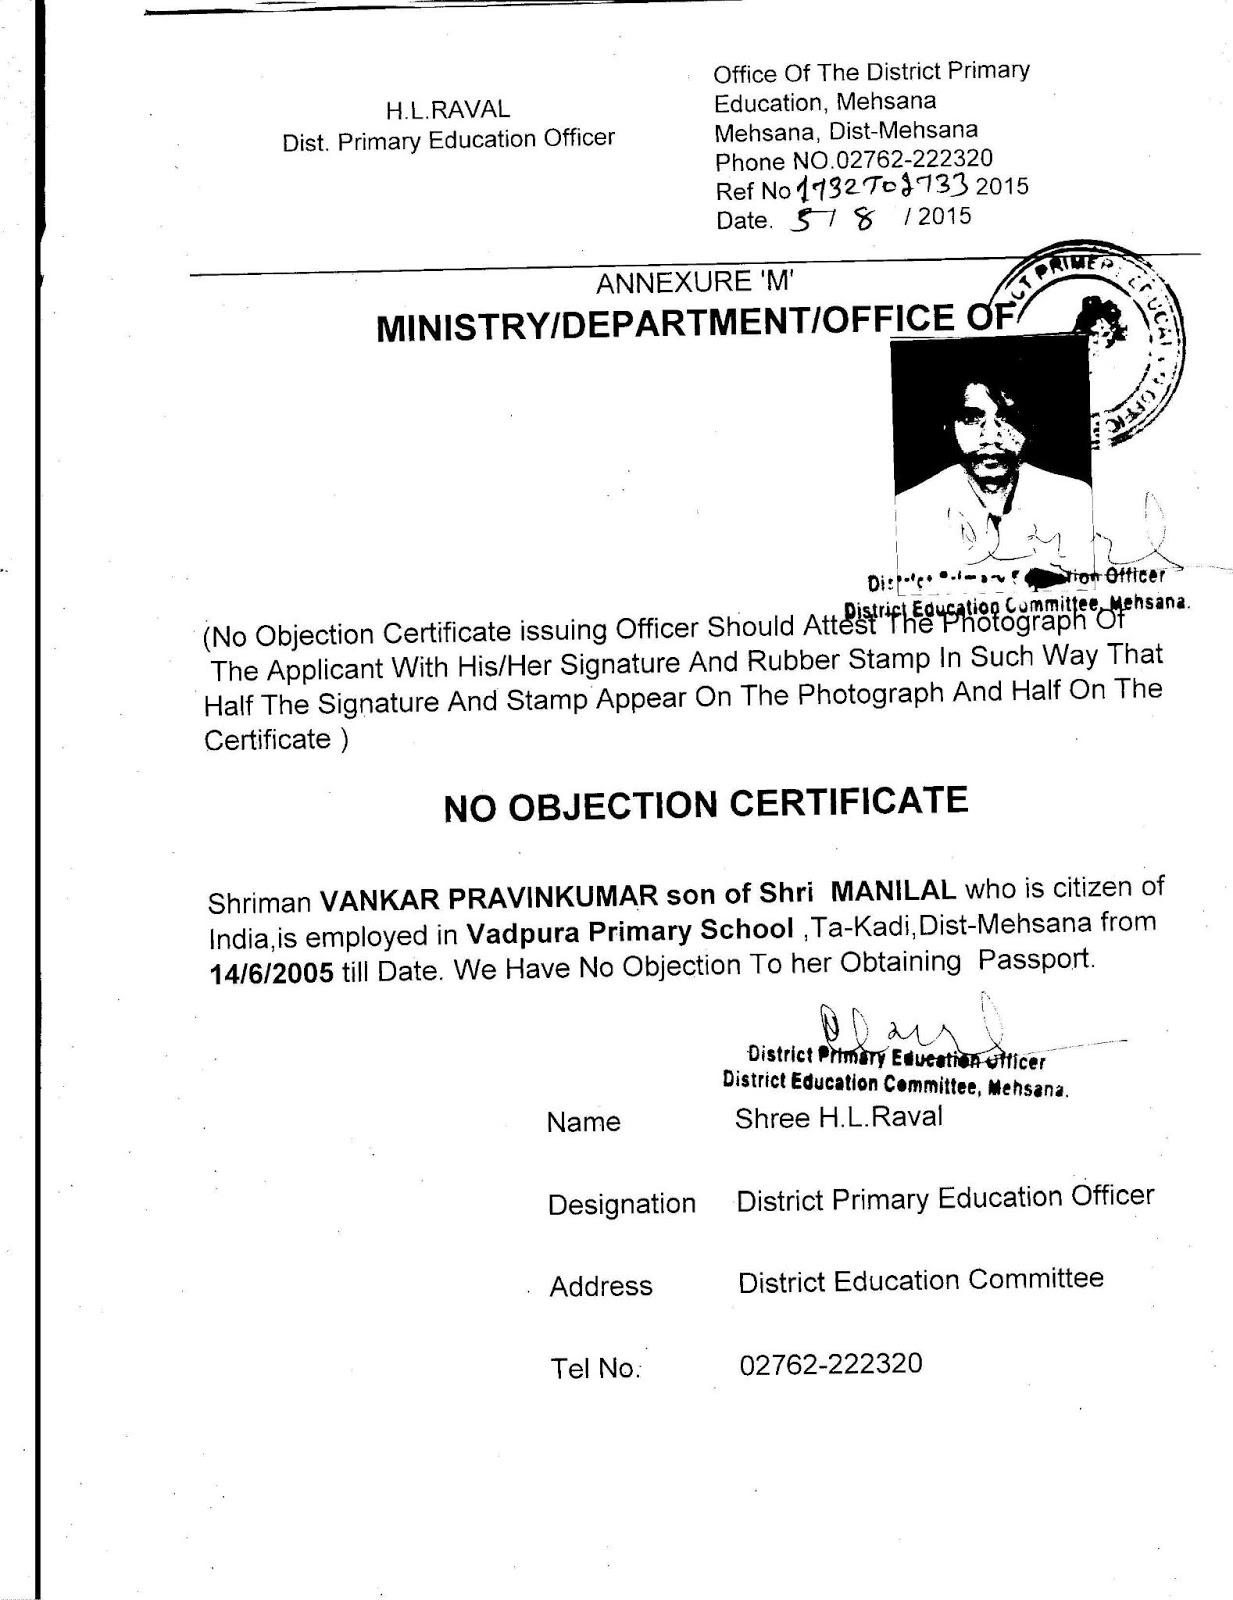 ALL EDUCATION NEWS PASSPORT NOC NA MANJOOR THAYELA KAGAL NO NAMOONO – No Objection Certificate for Passport